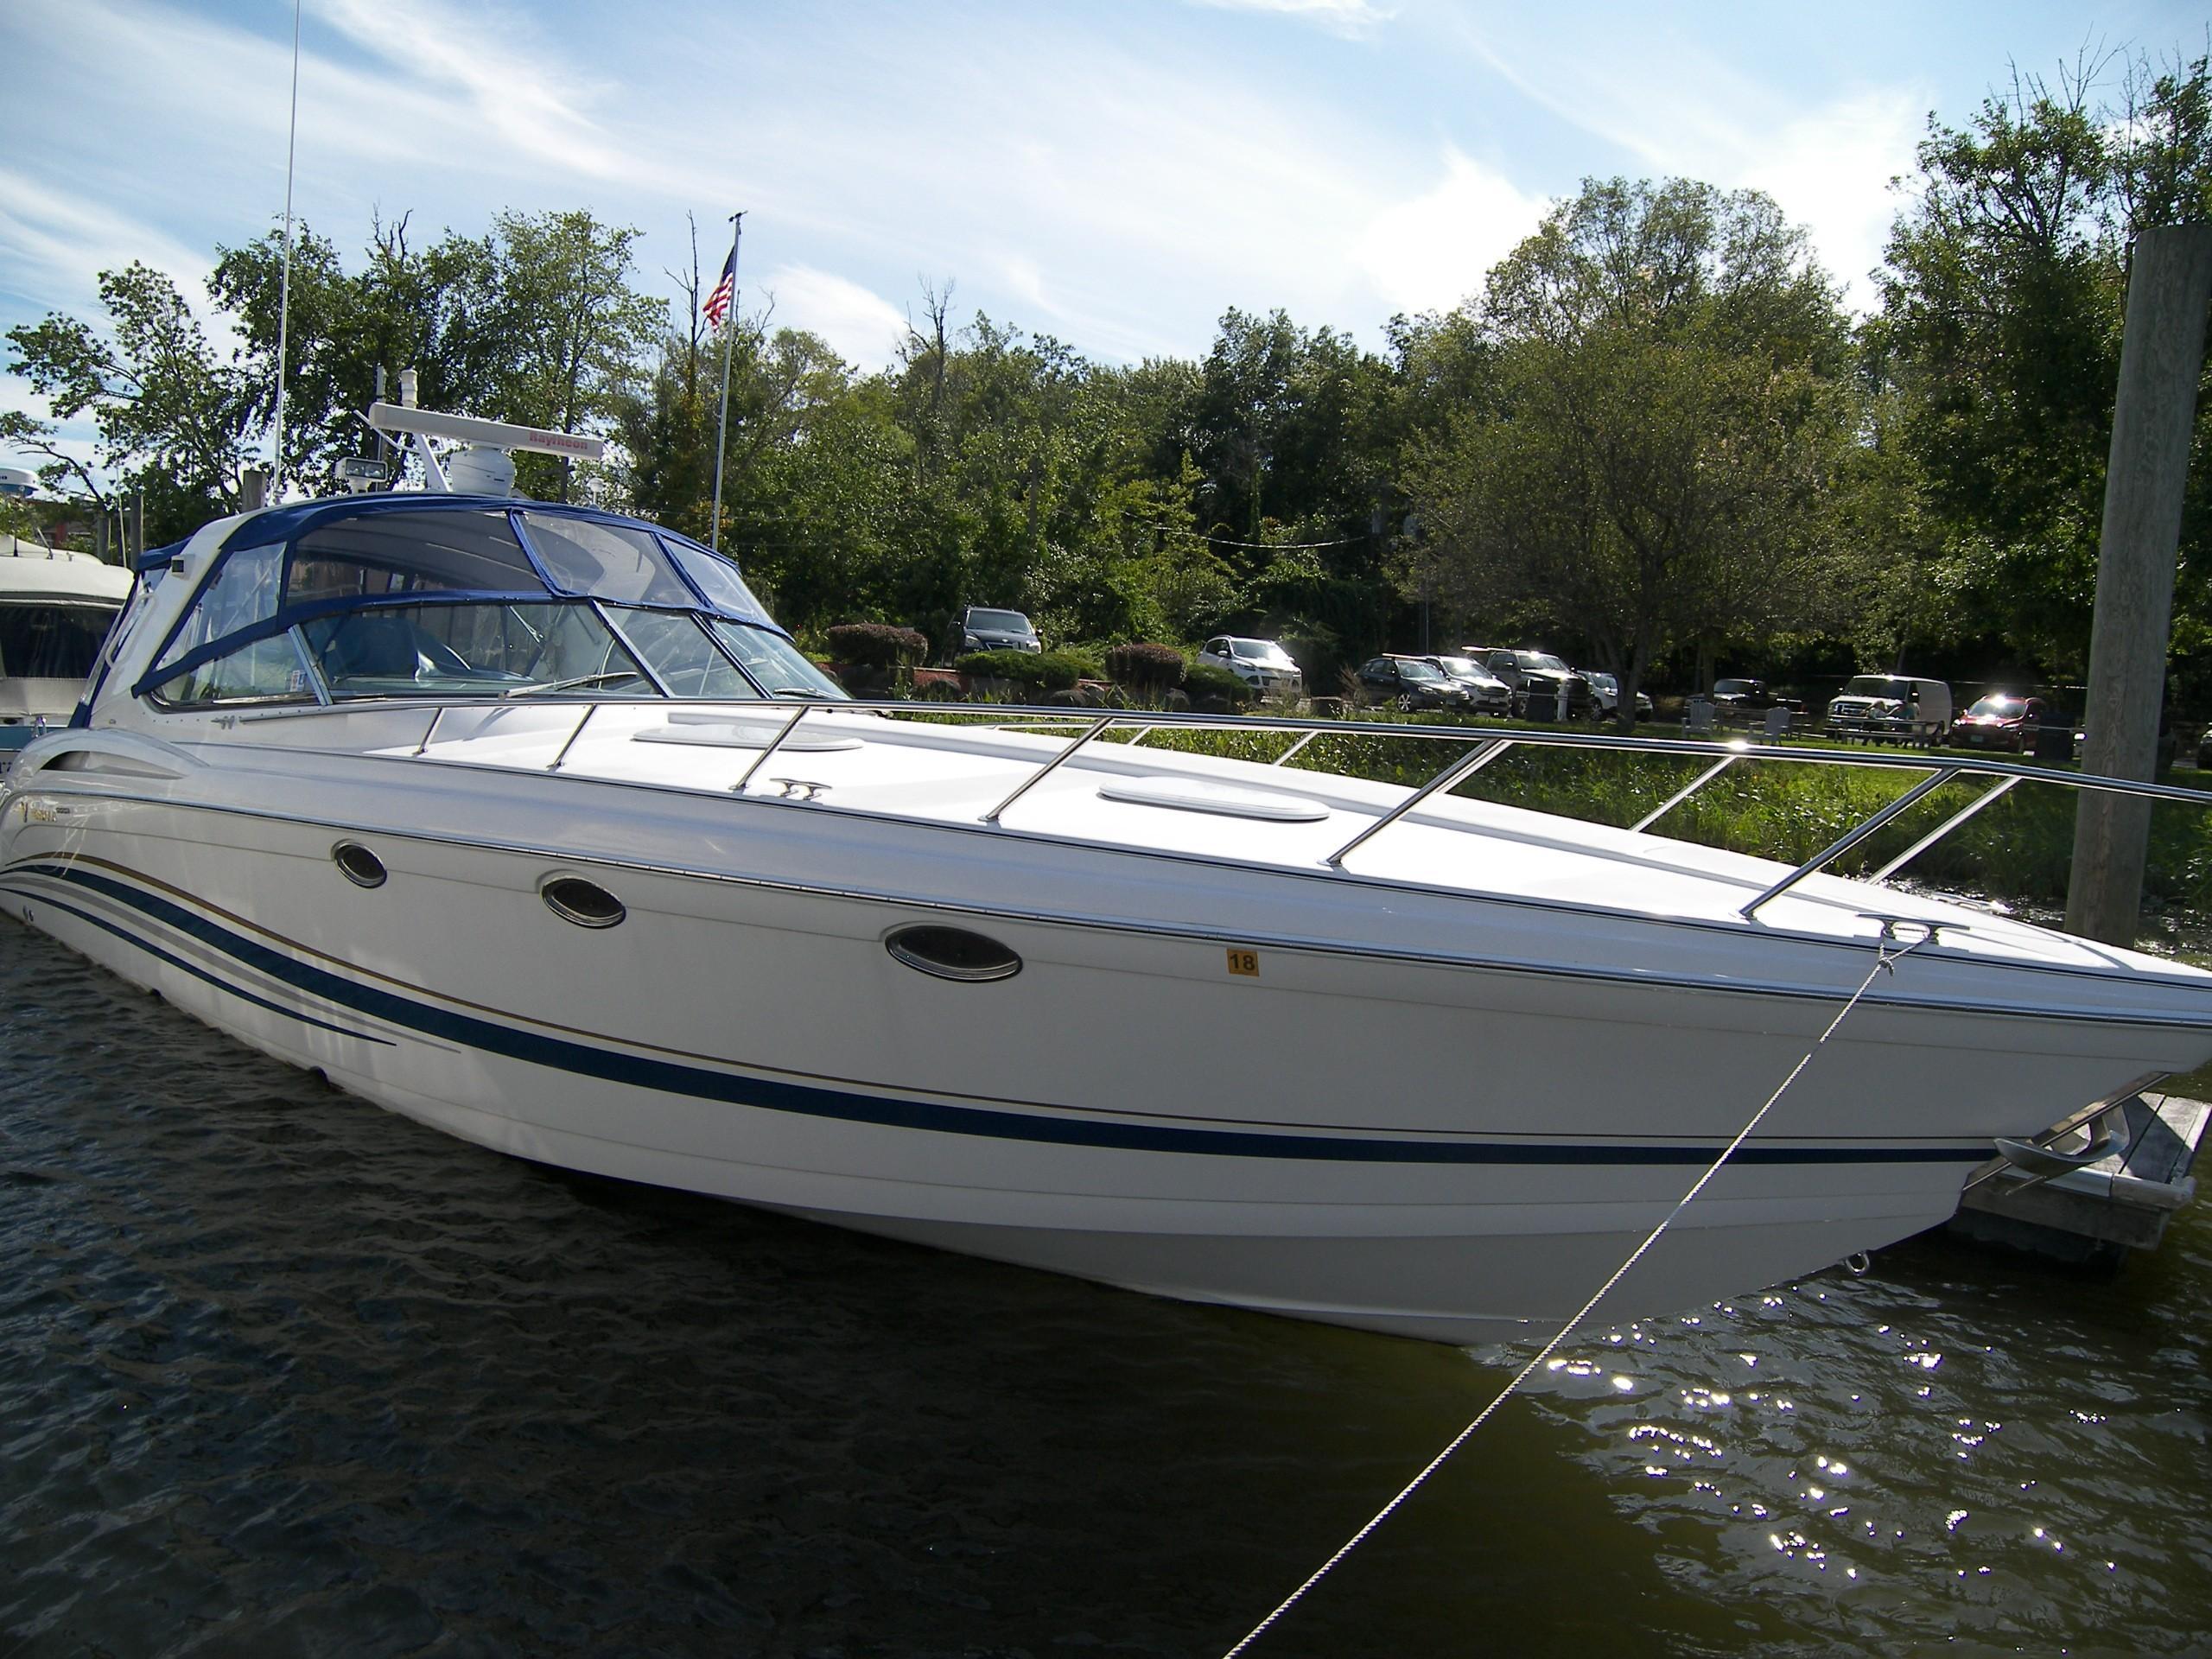 2000 Formula 400 Ss Power Boat For Sale Www Yachtworld Com